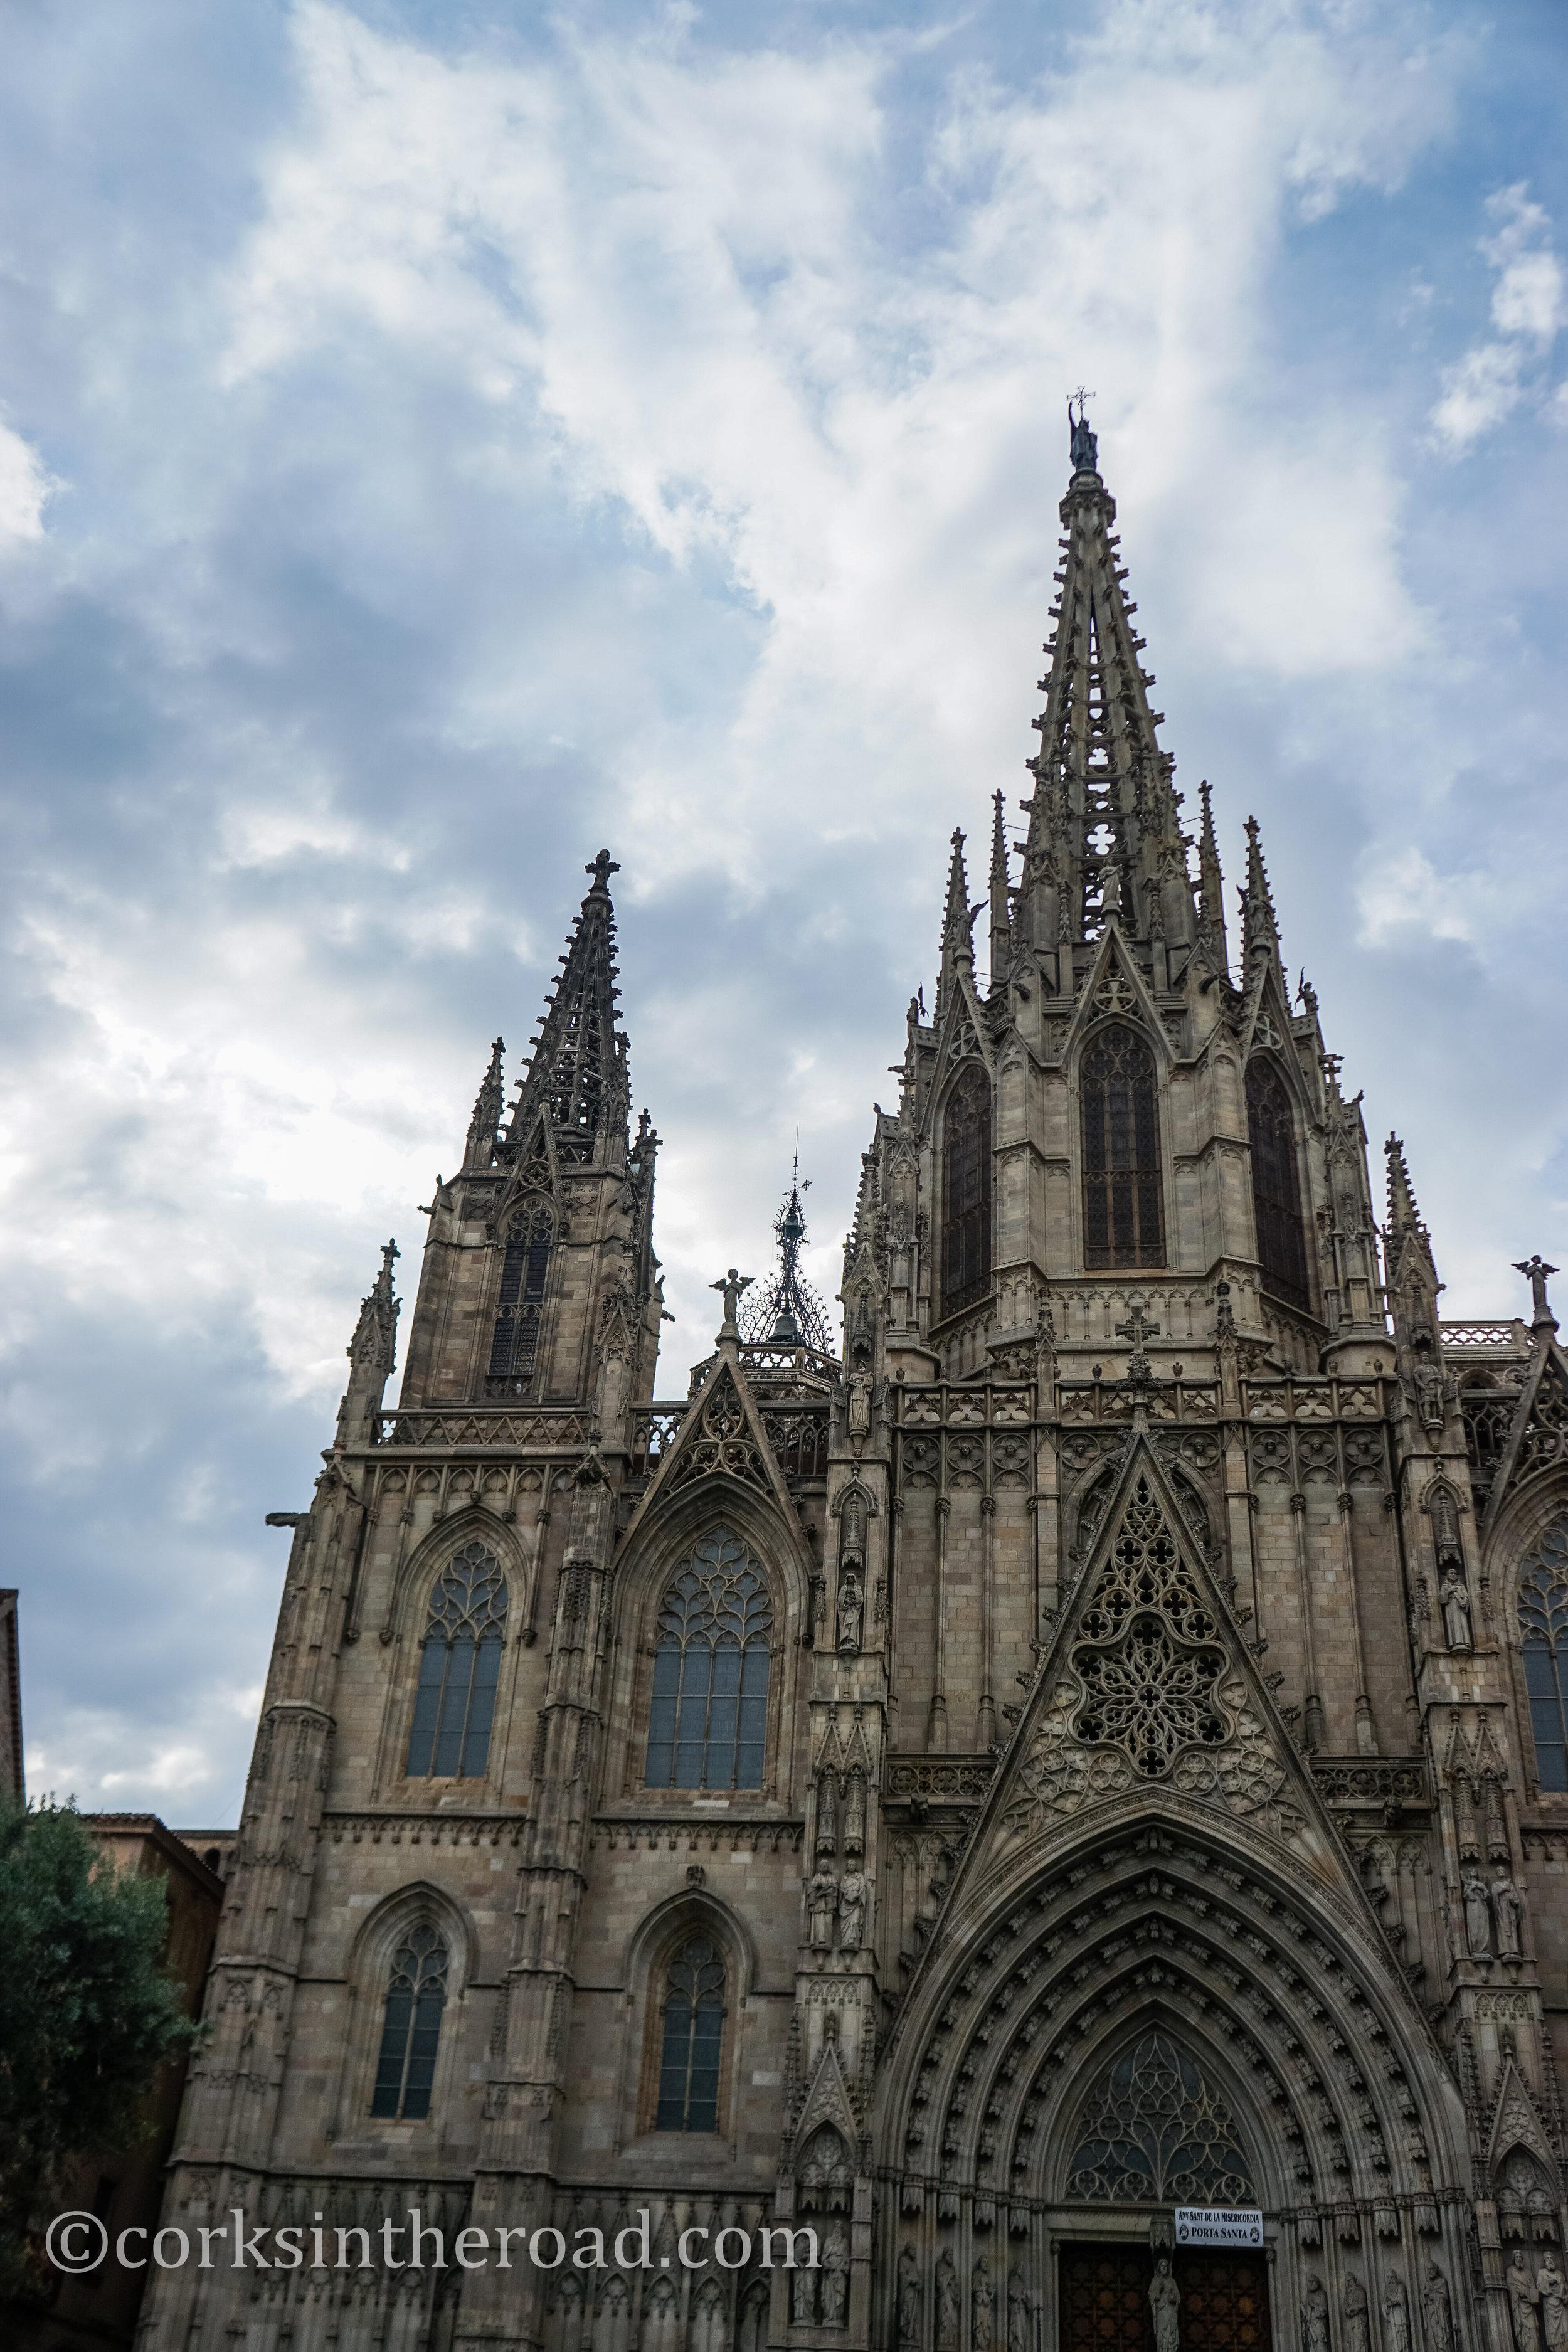 20160805Architecture, Barcelona, Corksintheroad-3.jpg